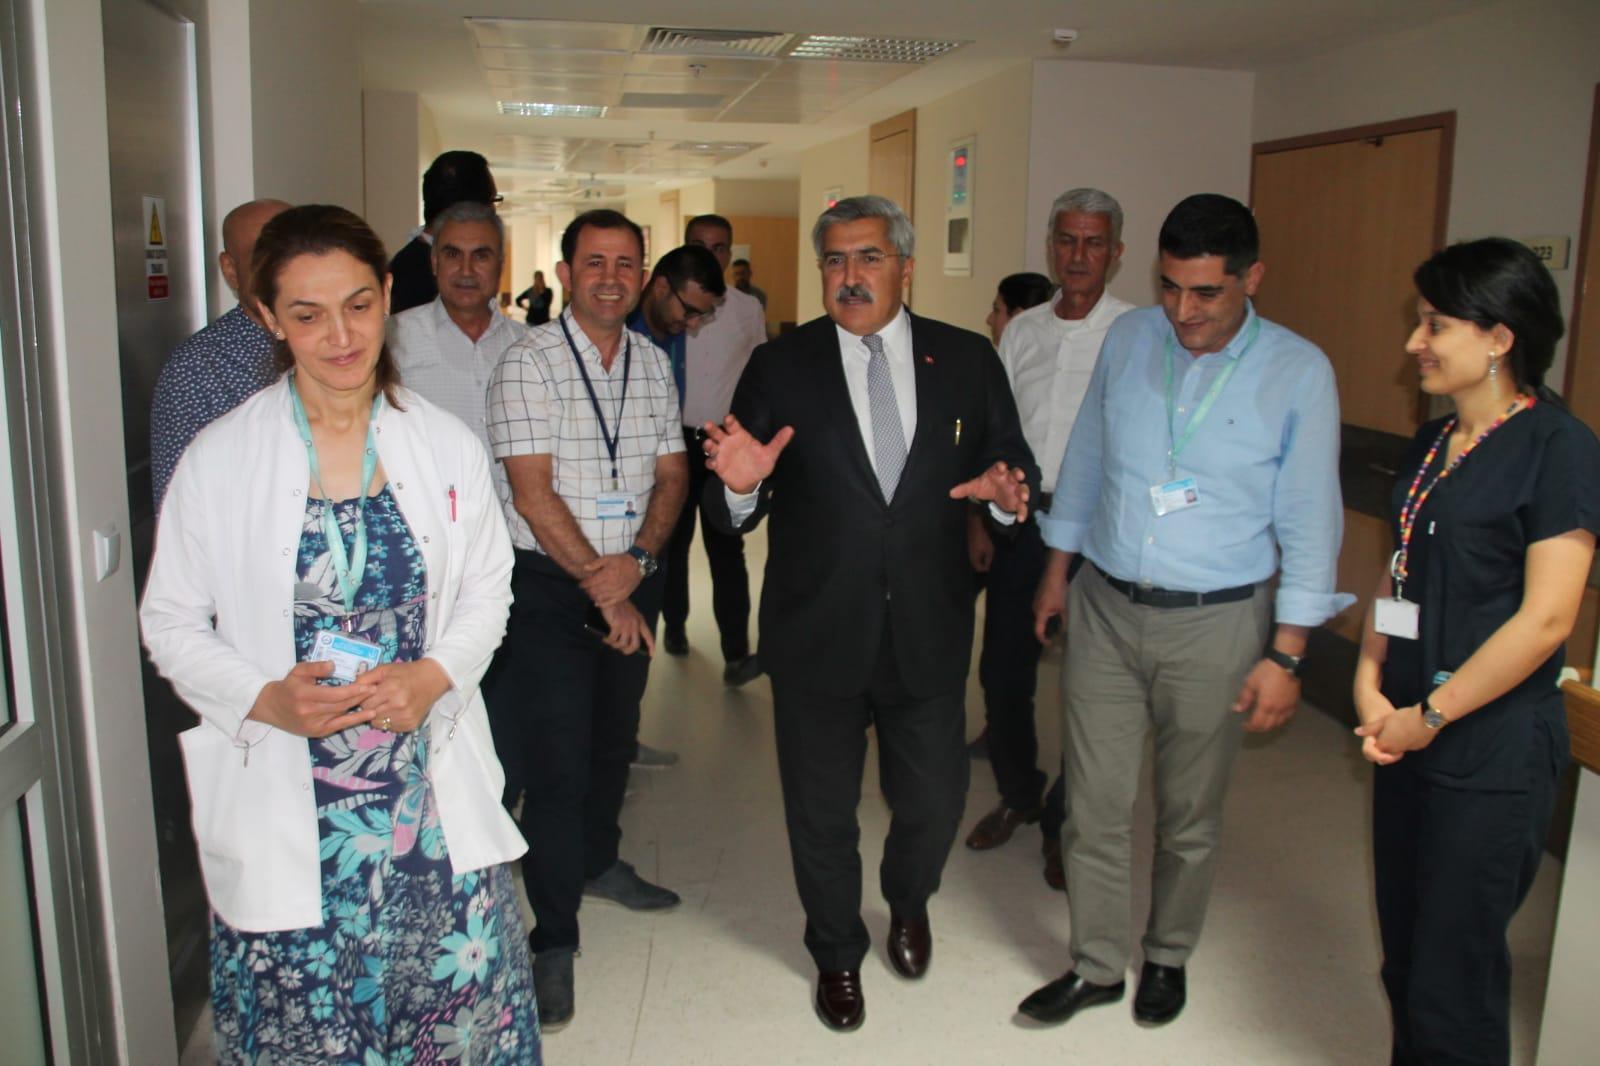 Milletvekili Yayman, Devlet Hastanesini ziyaret etti